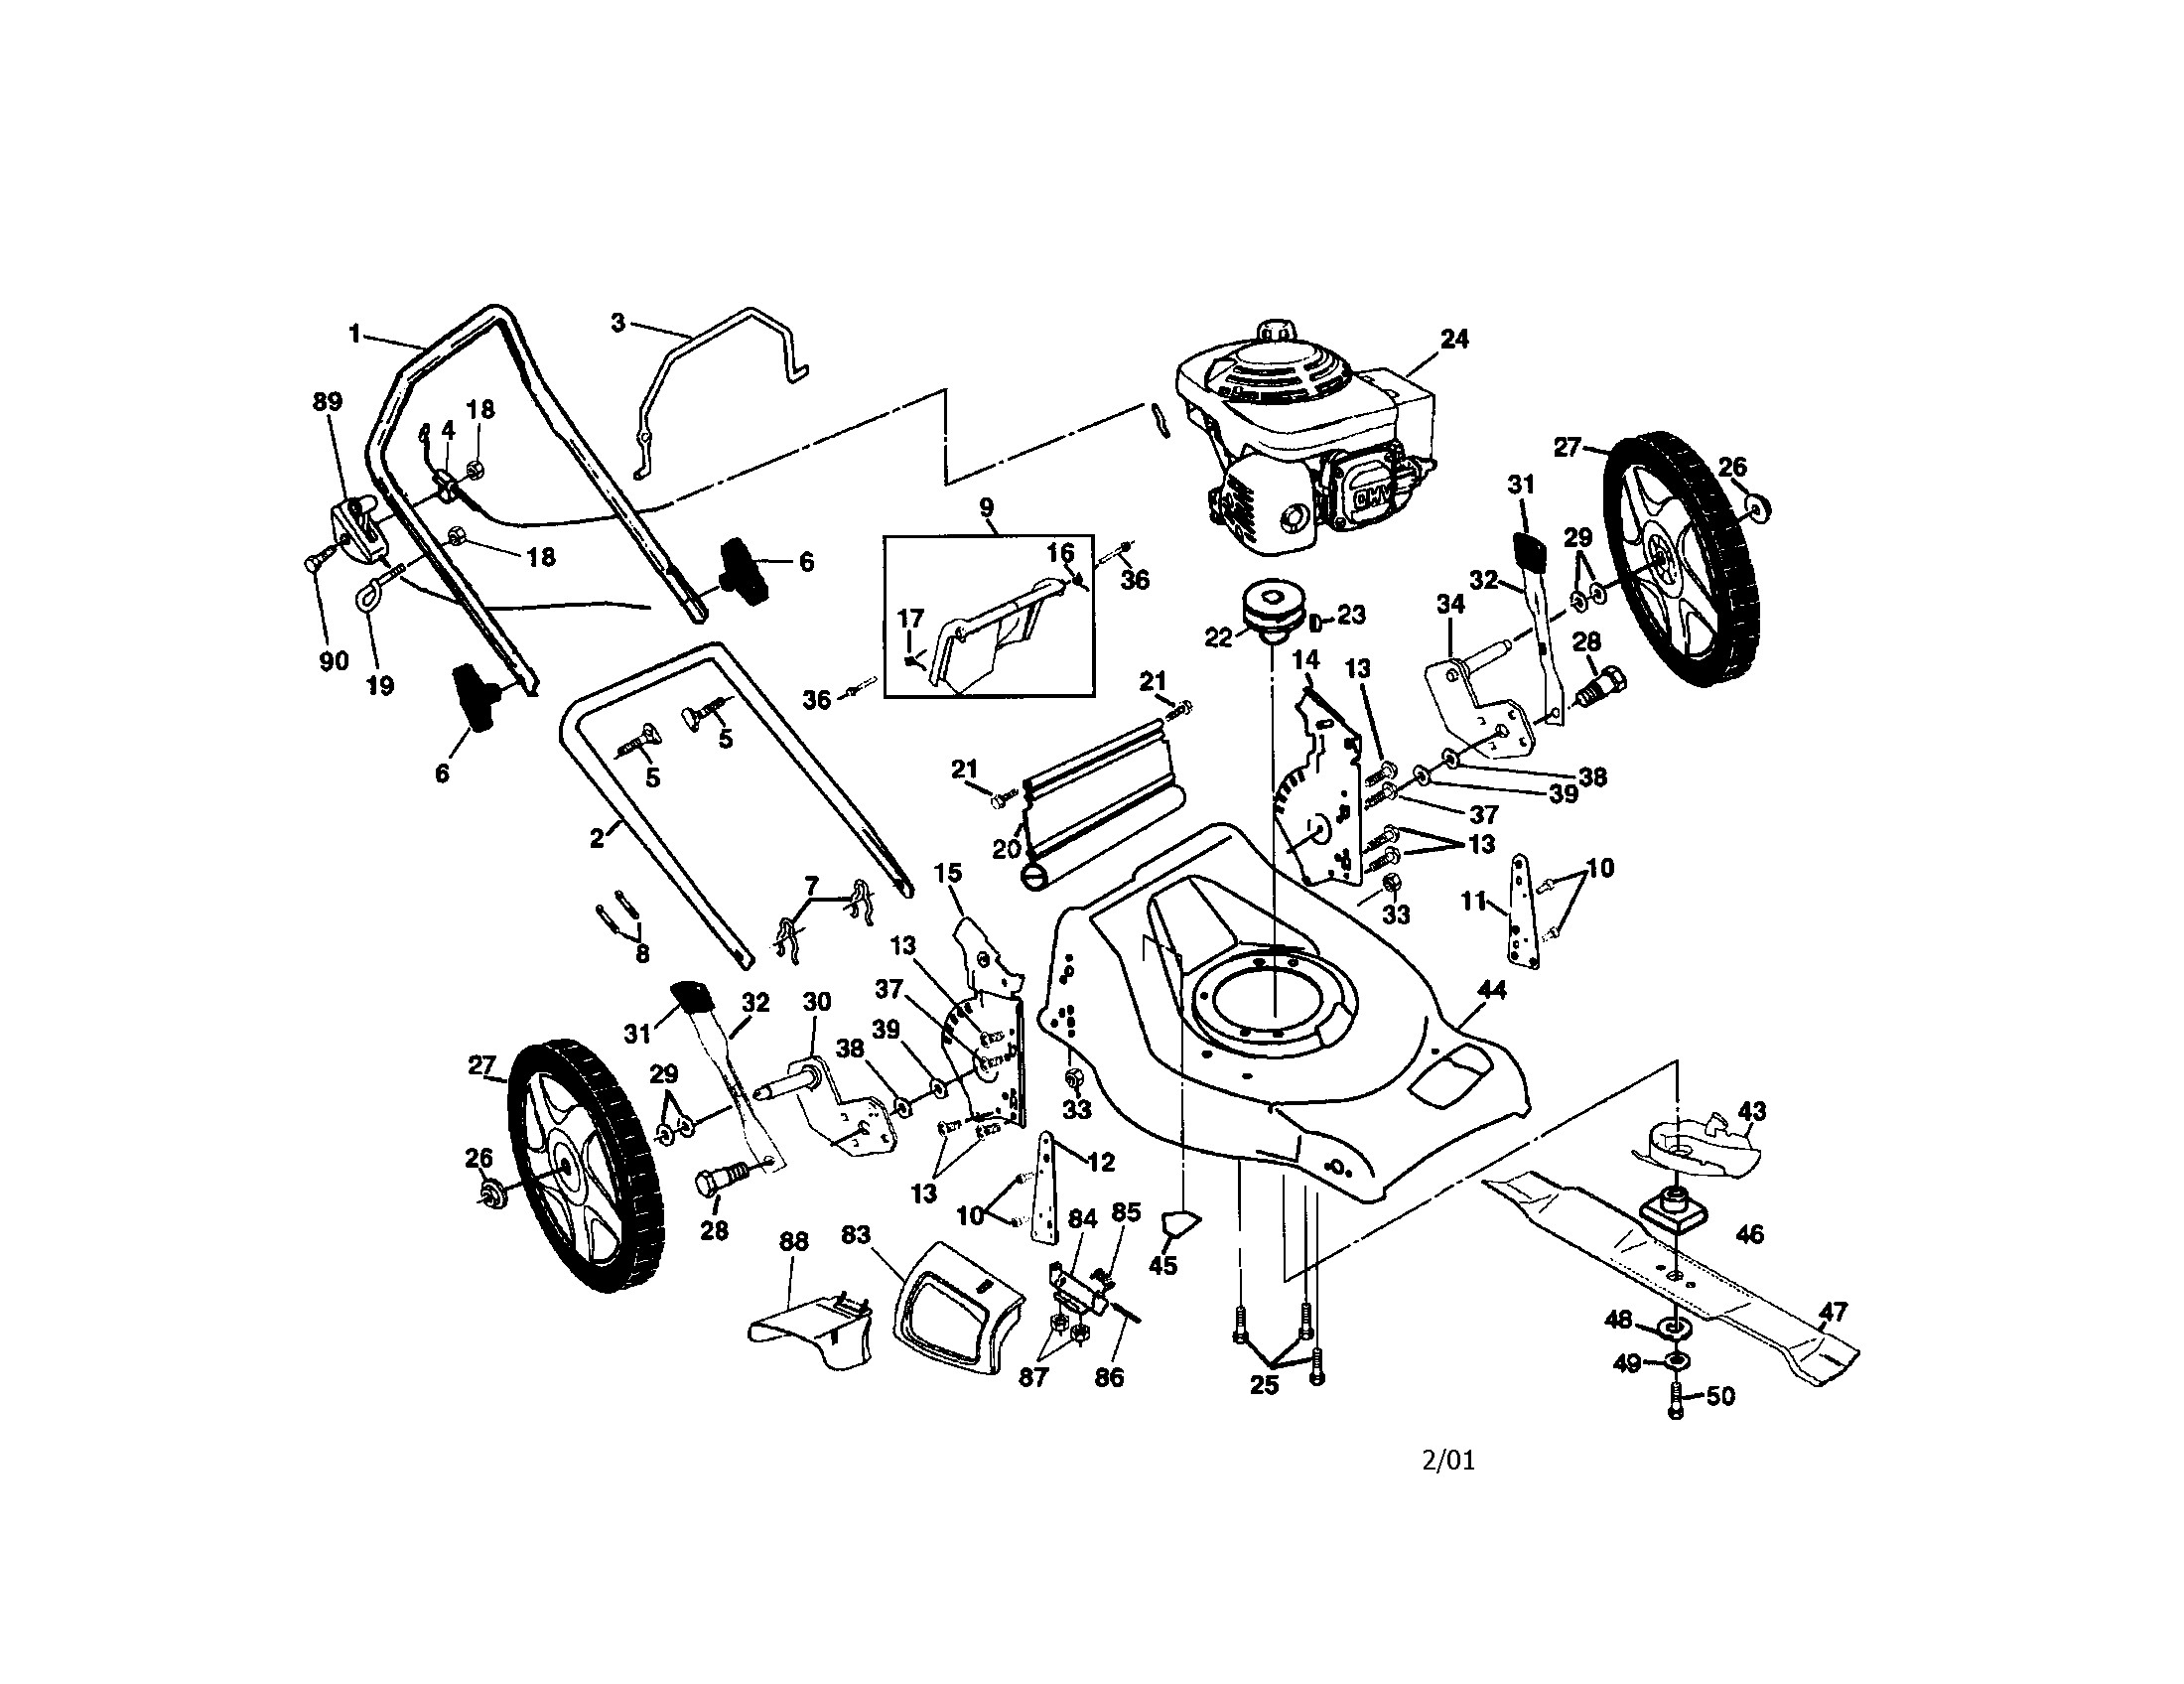 Honda Gc160 Parts Diagram Poulan Model Pr55hy21ca Walk Behind Lawnmower Gas Genuine Parts Of Honda Gc160 Parts Diagram